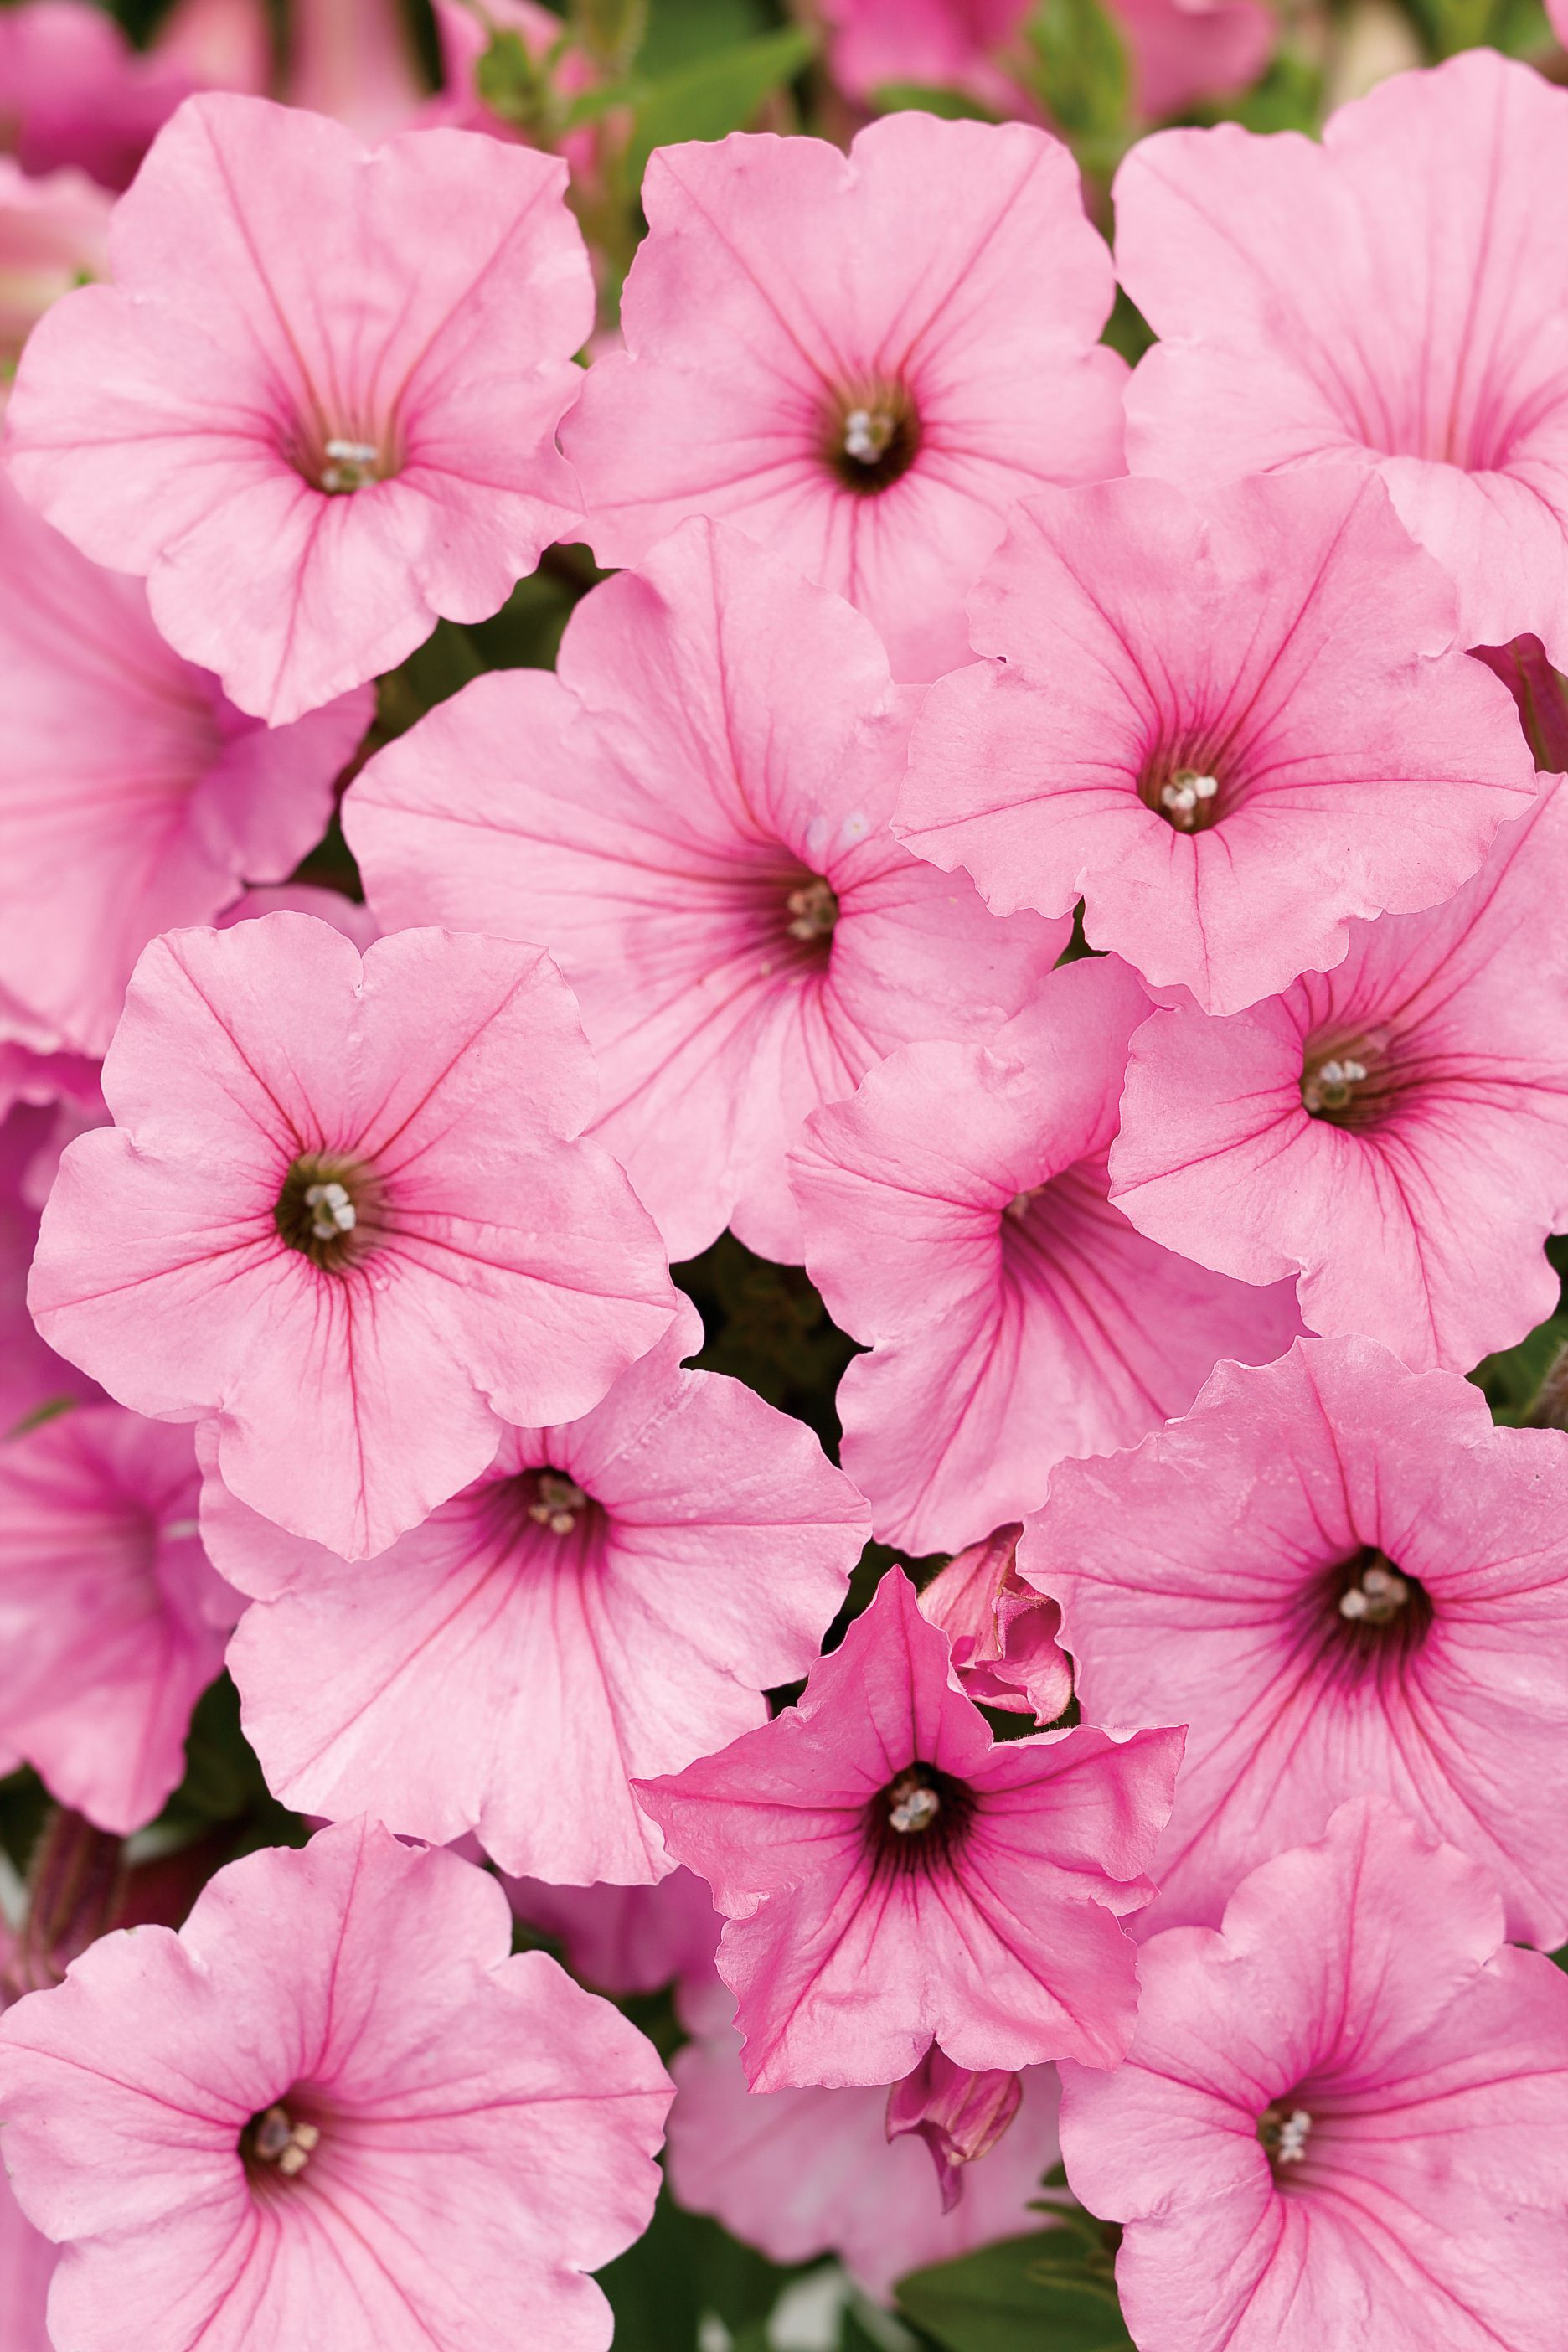 Supertunia Vista Bubblegum Petunia Hybrid Petunias Pink